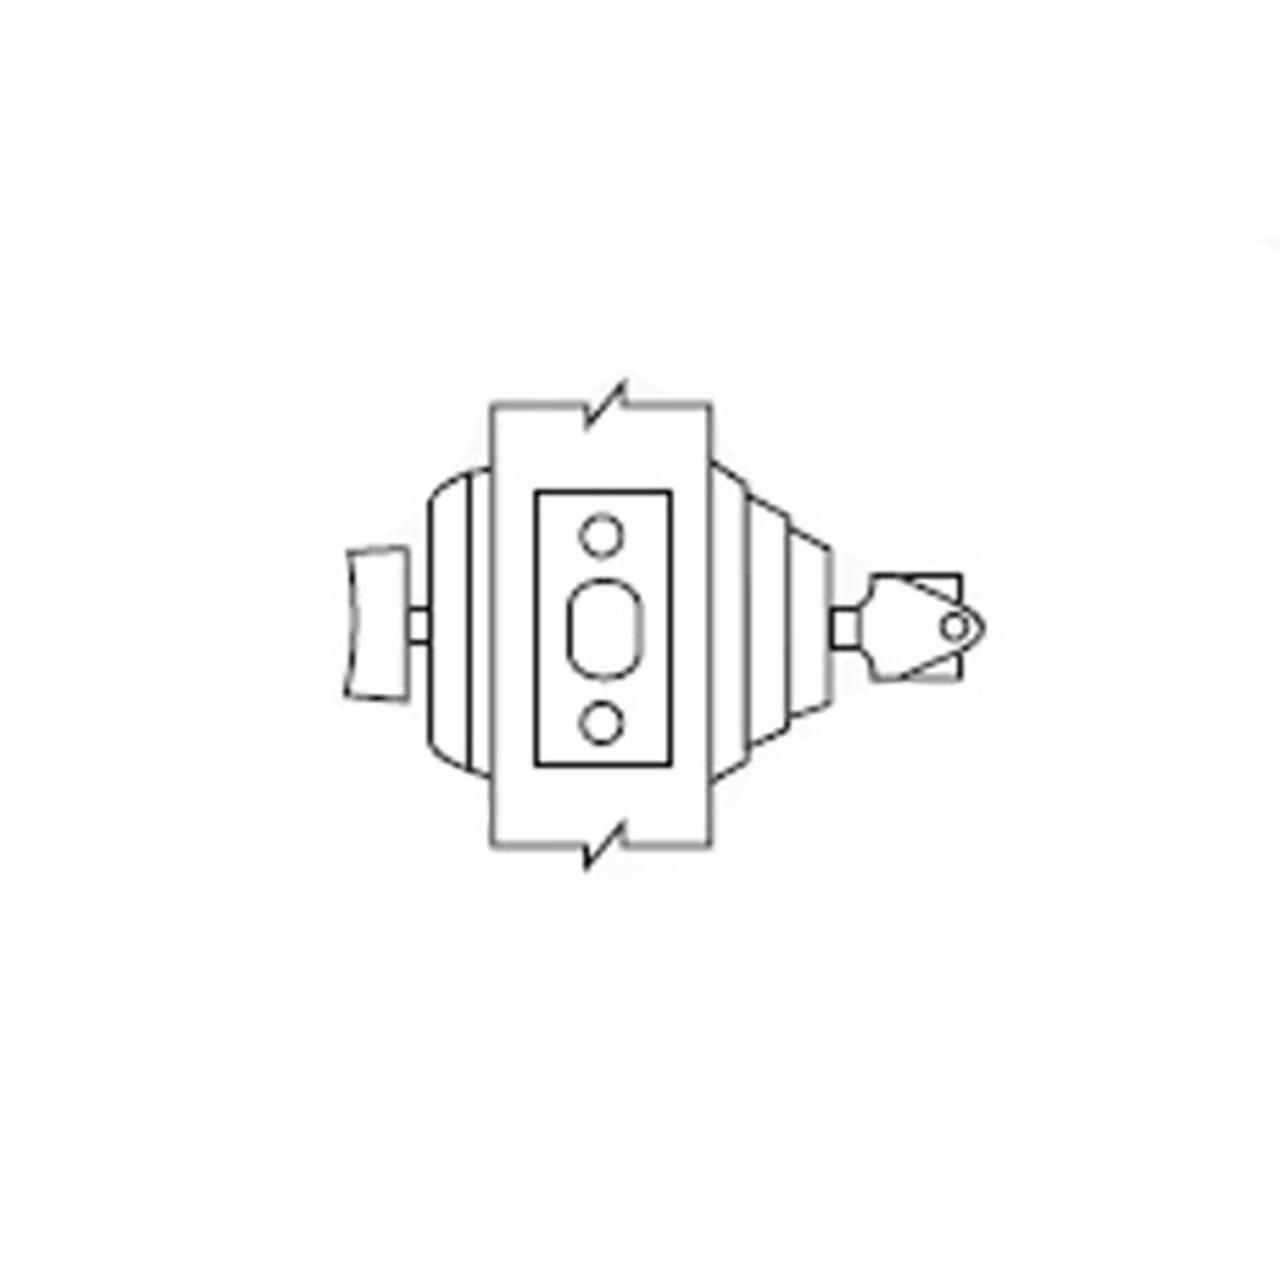 E61-03 Arrow Lock E Series Deadbolt Single Cylinder with Thumbturn in Bright Brass